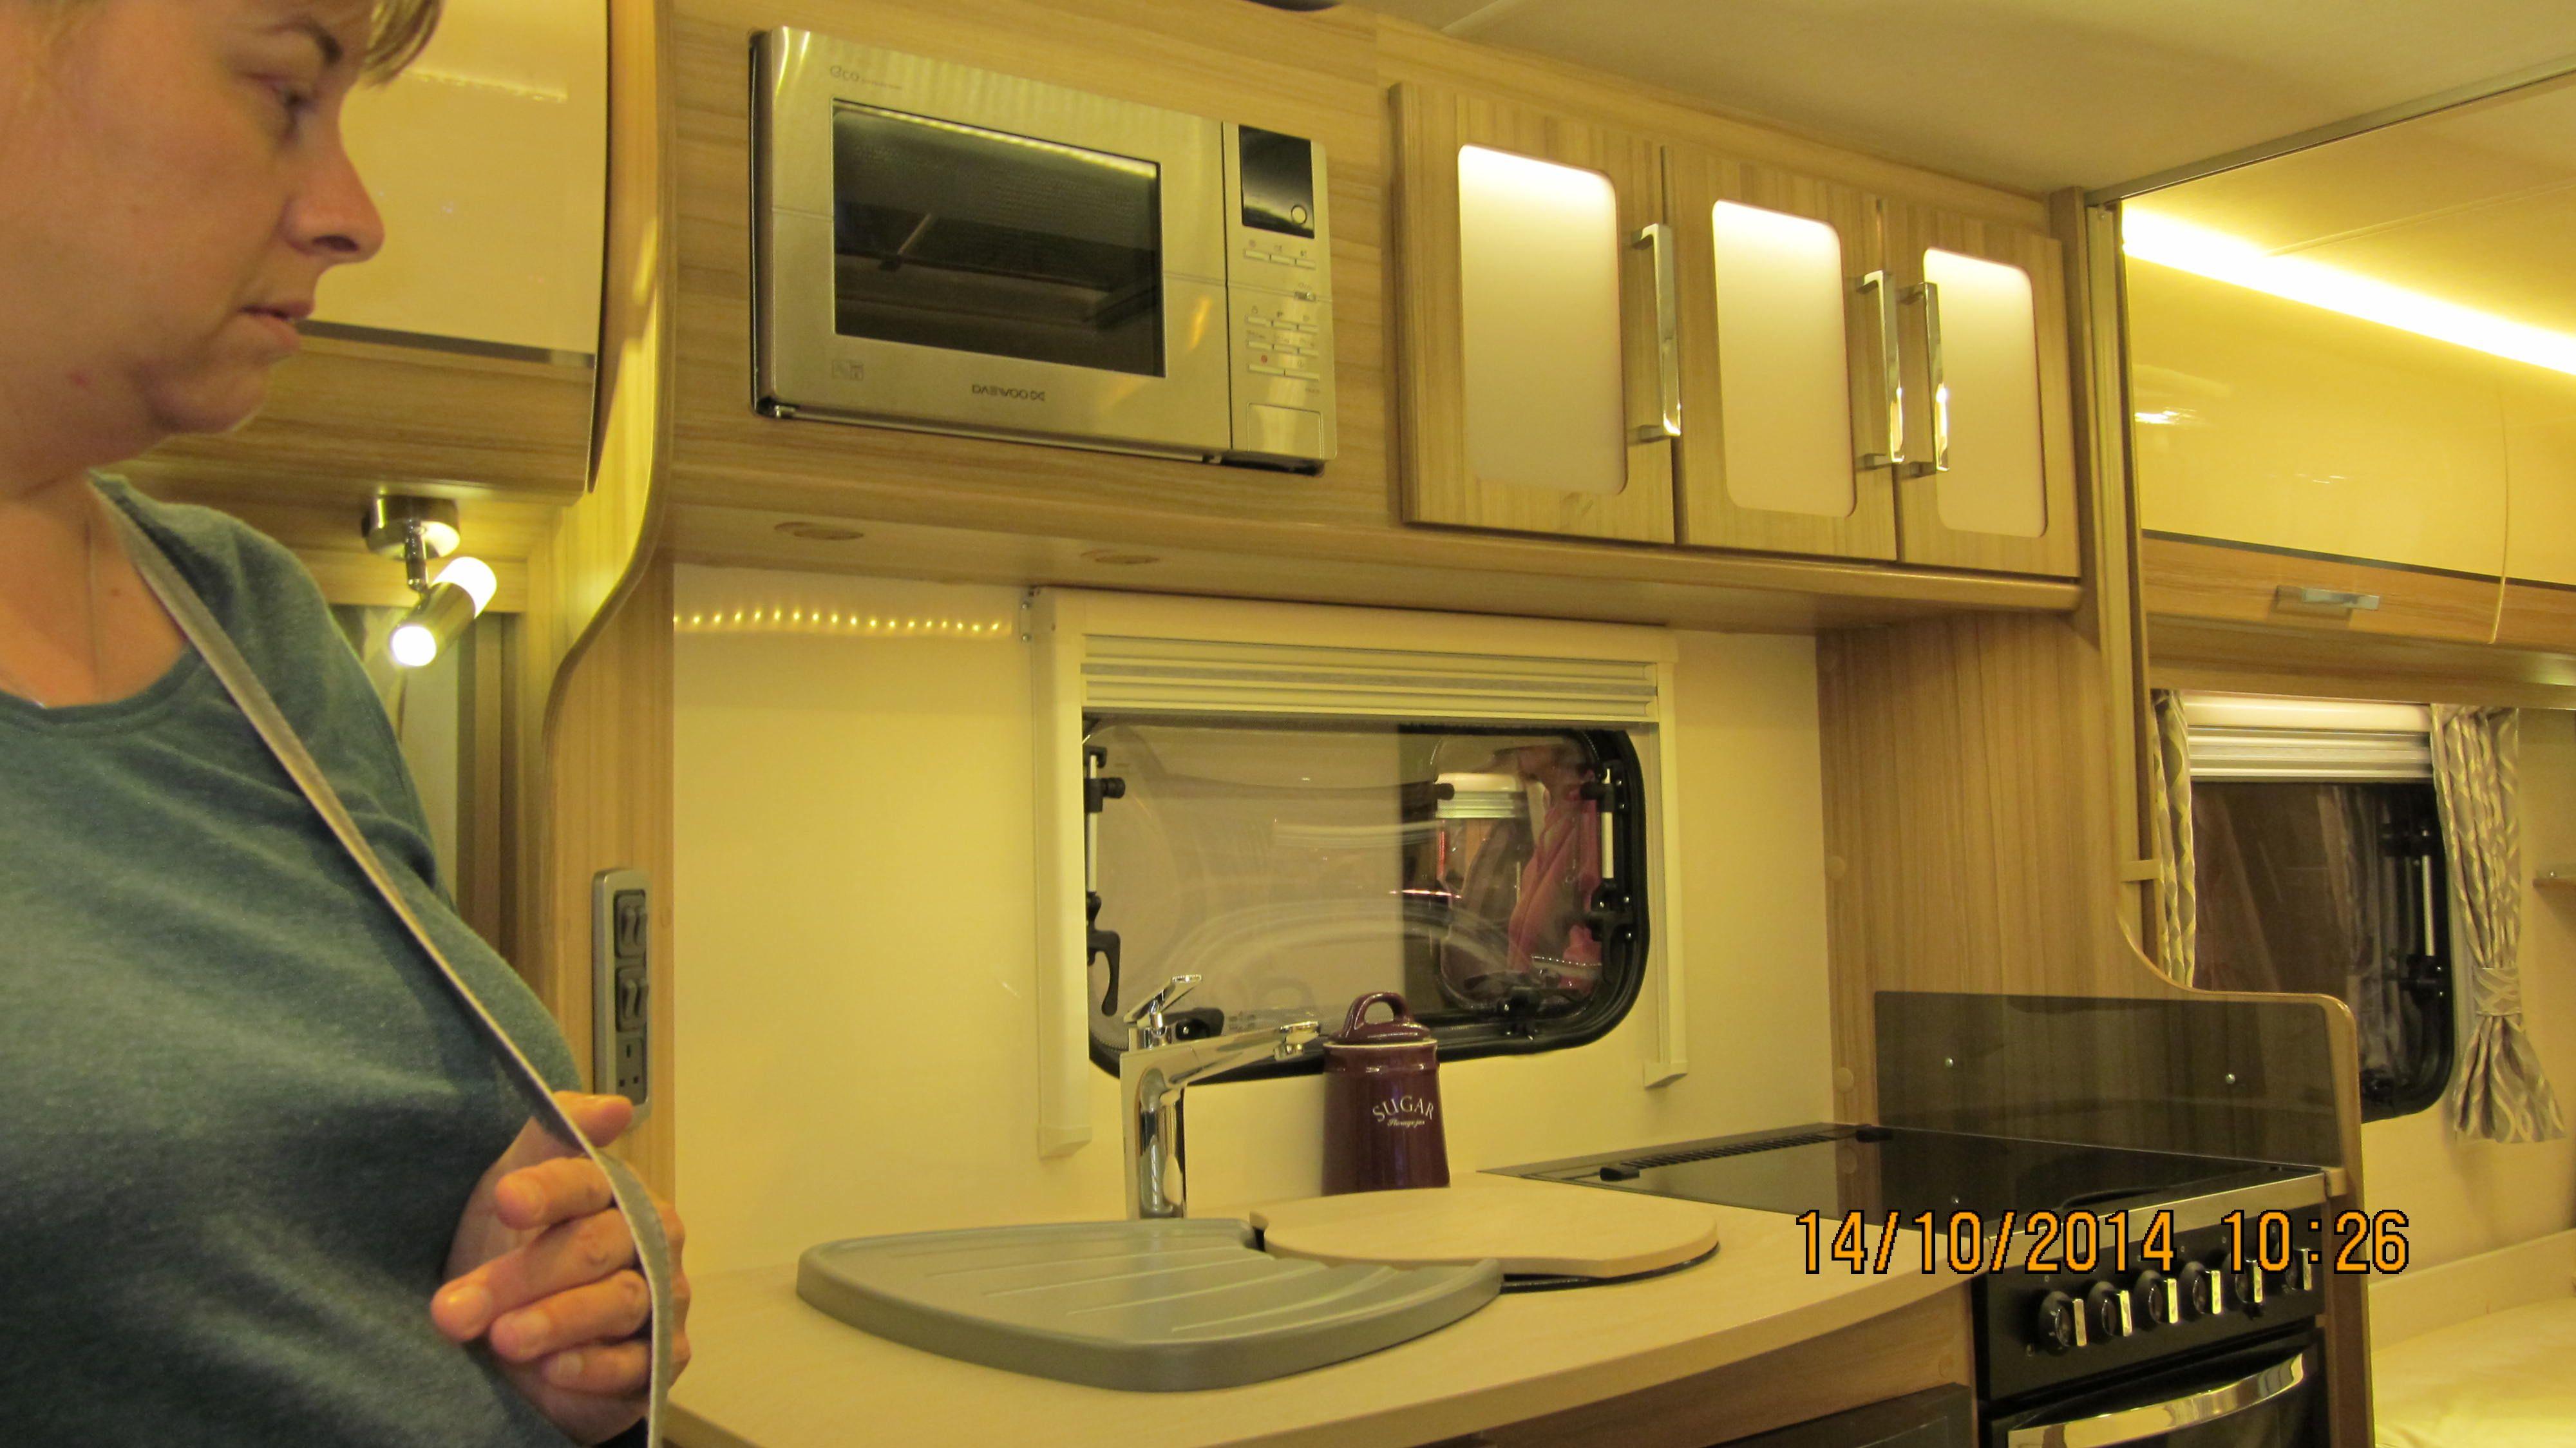 Lunar Clubman Sb Kitchen Area Microwave Above Sink Small Fridge